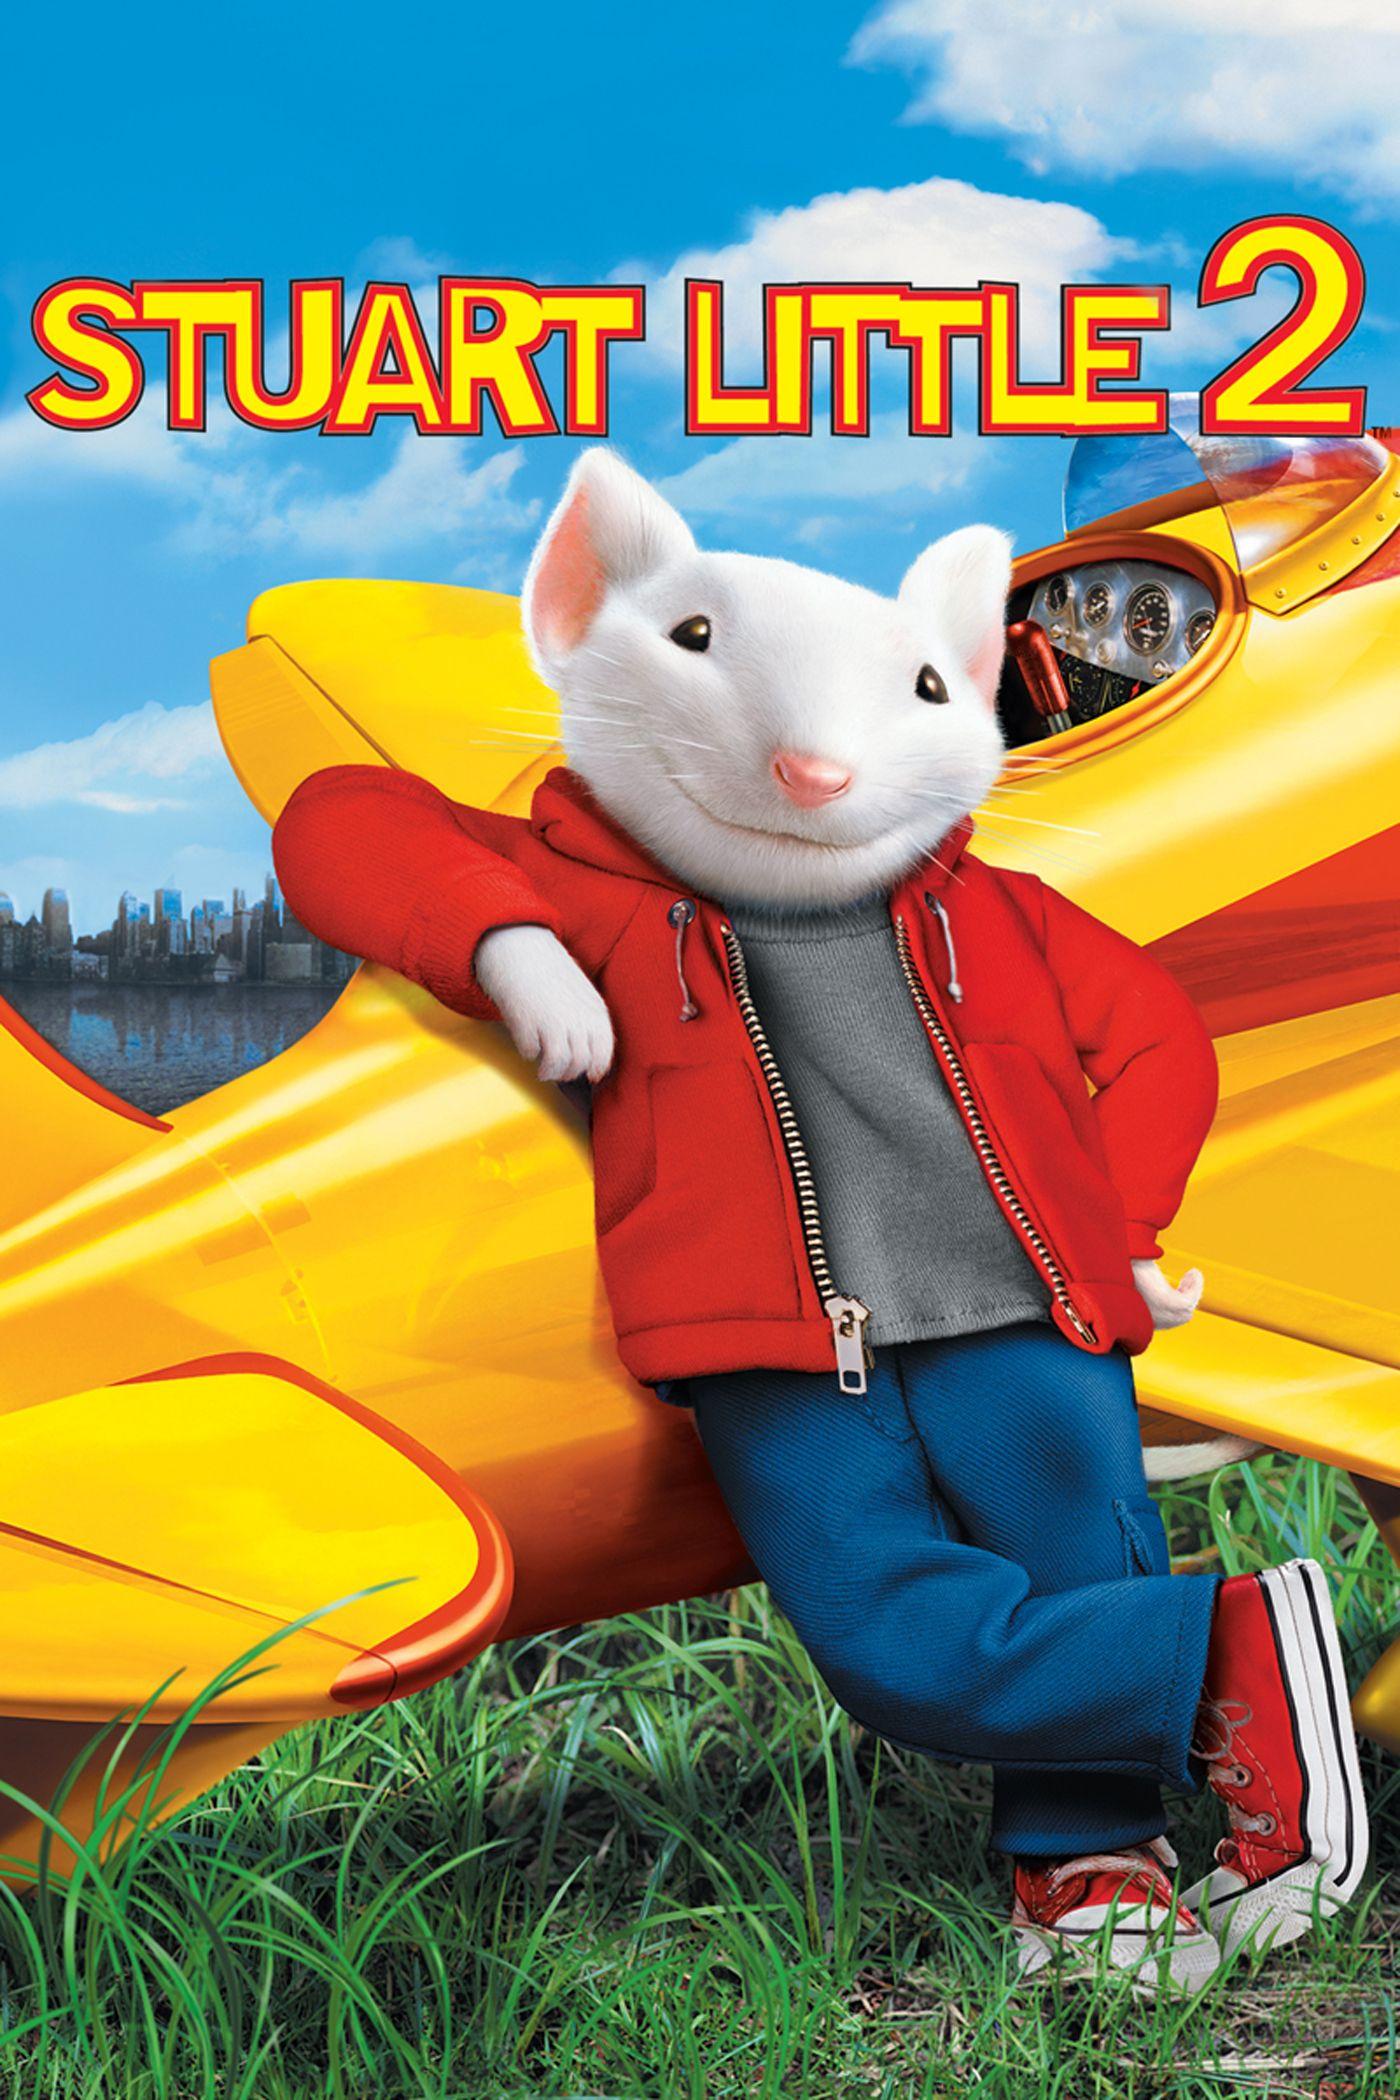 Stuart little 2 full movie, online, free in hindi